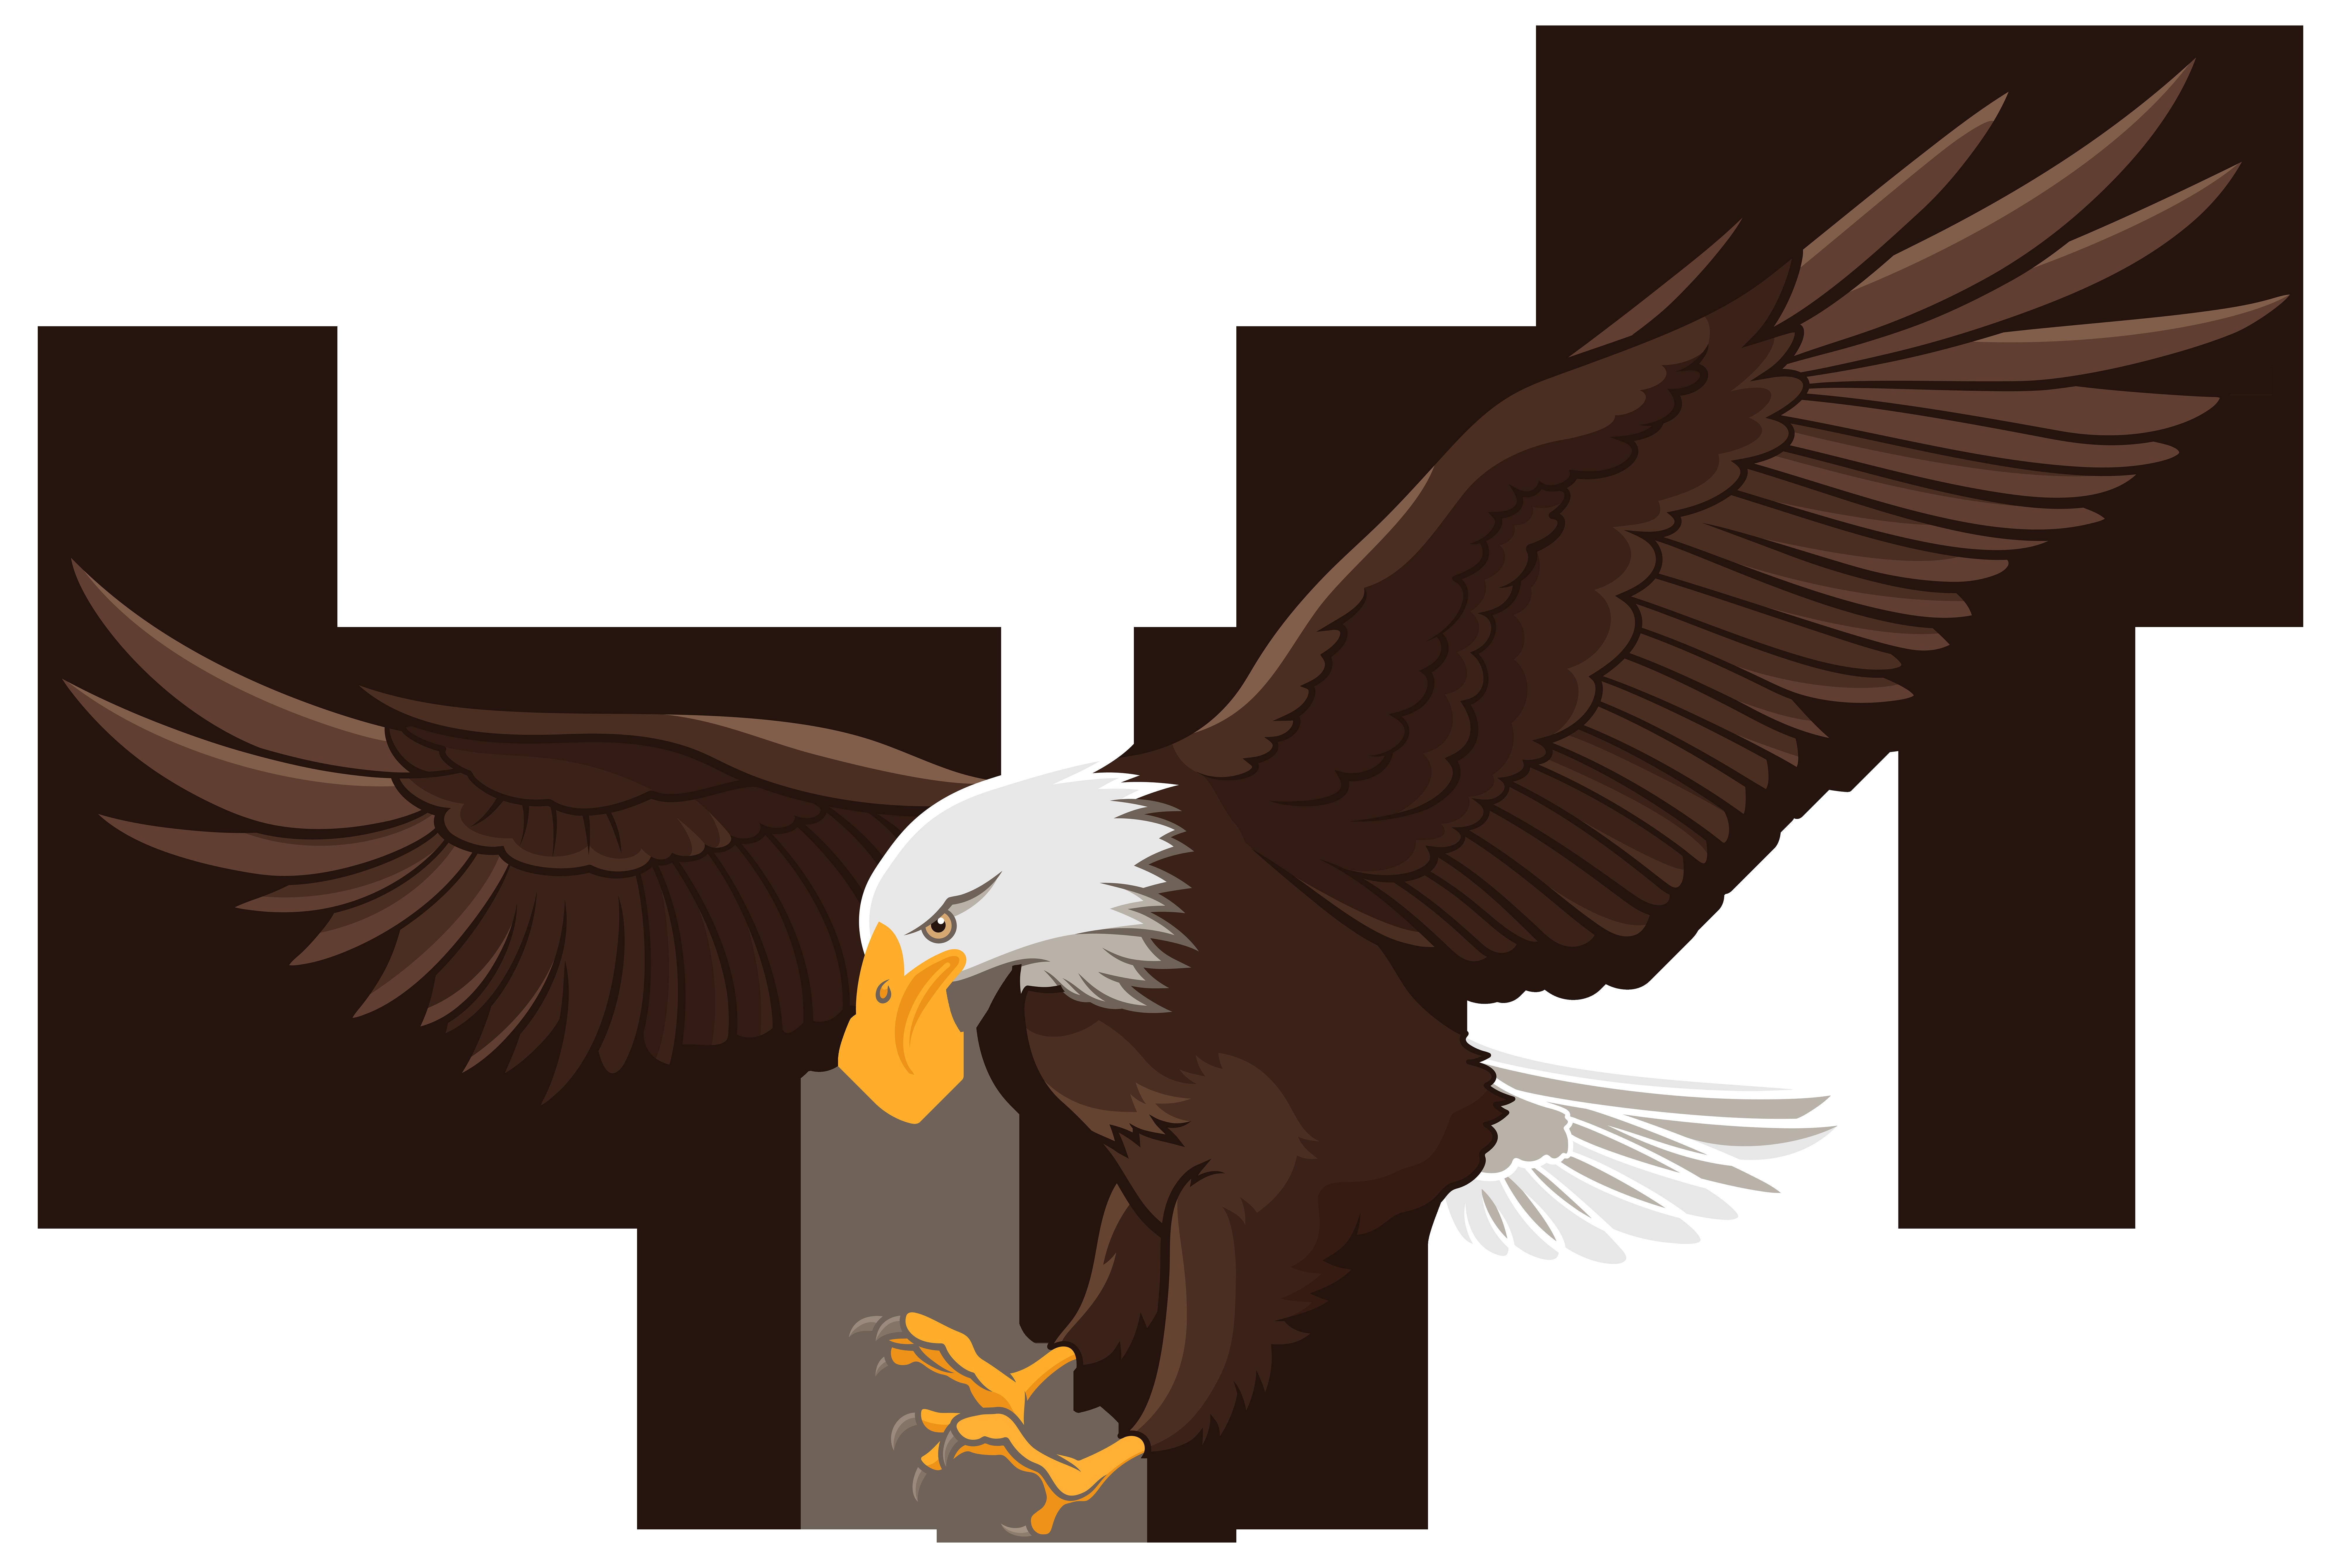 8000x5359 Eagle Images Clip Art Many Interesting Cliparts